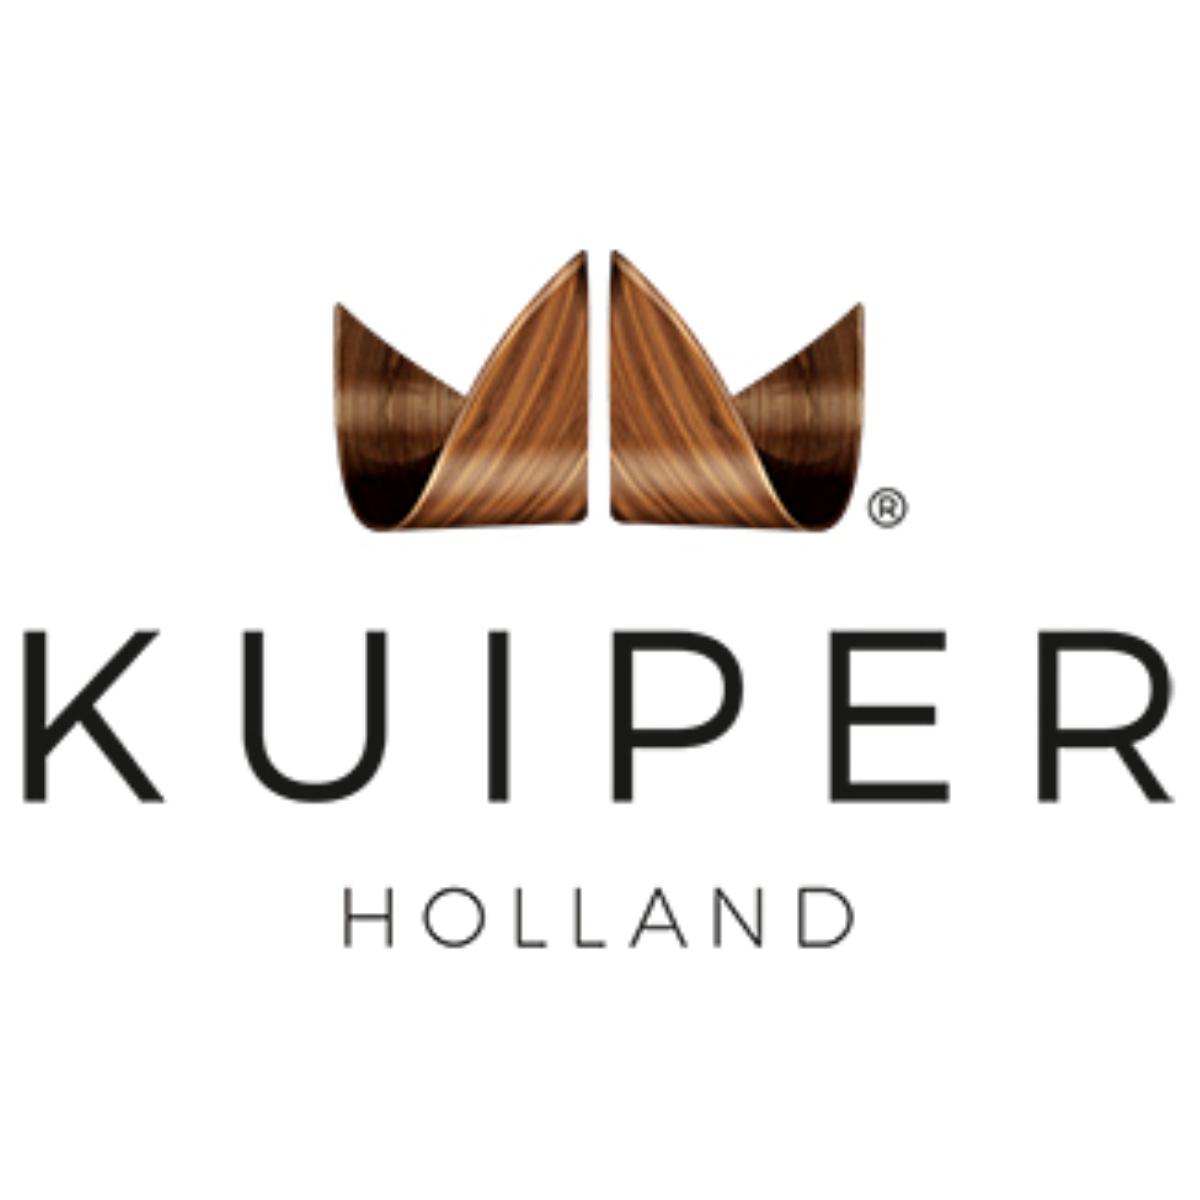 Kuiper Holland